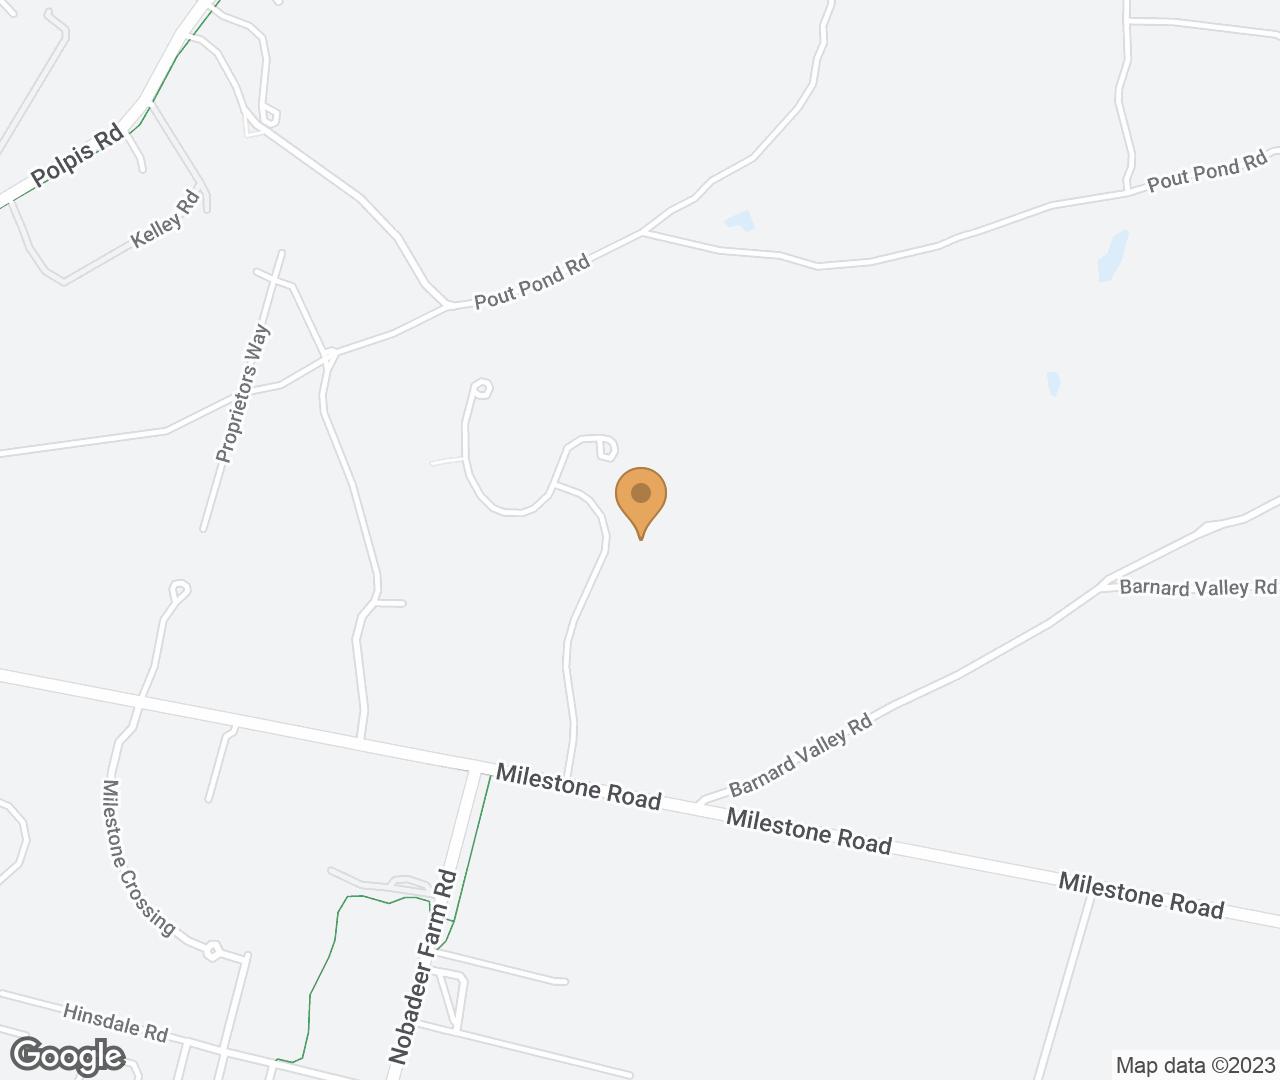 Google Map of 7 Tetawkimmo Drive, Nantucket, MA, USA